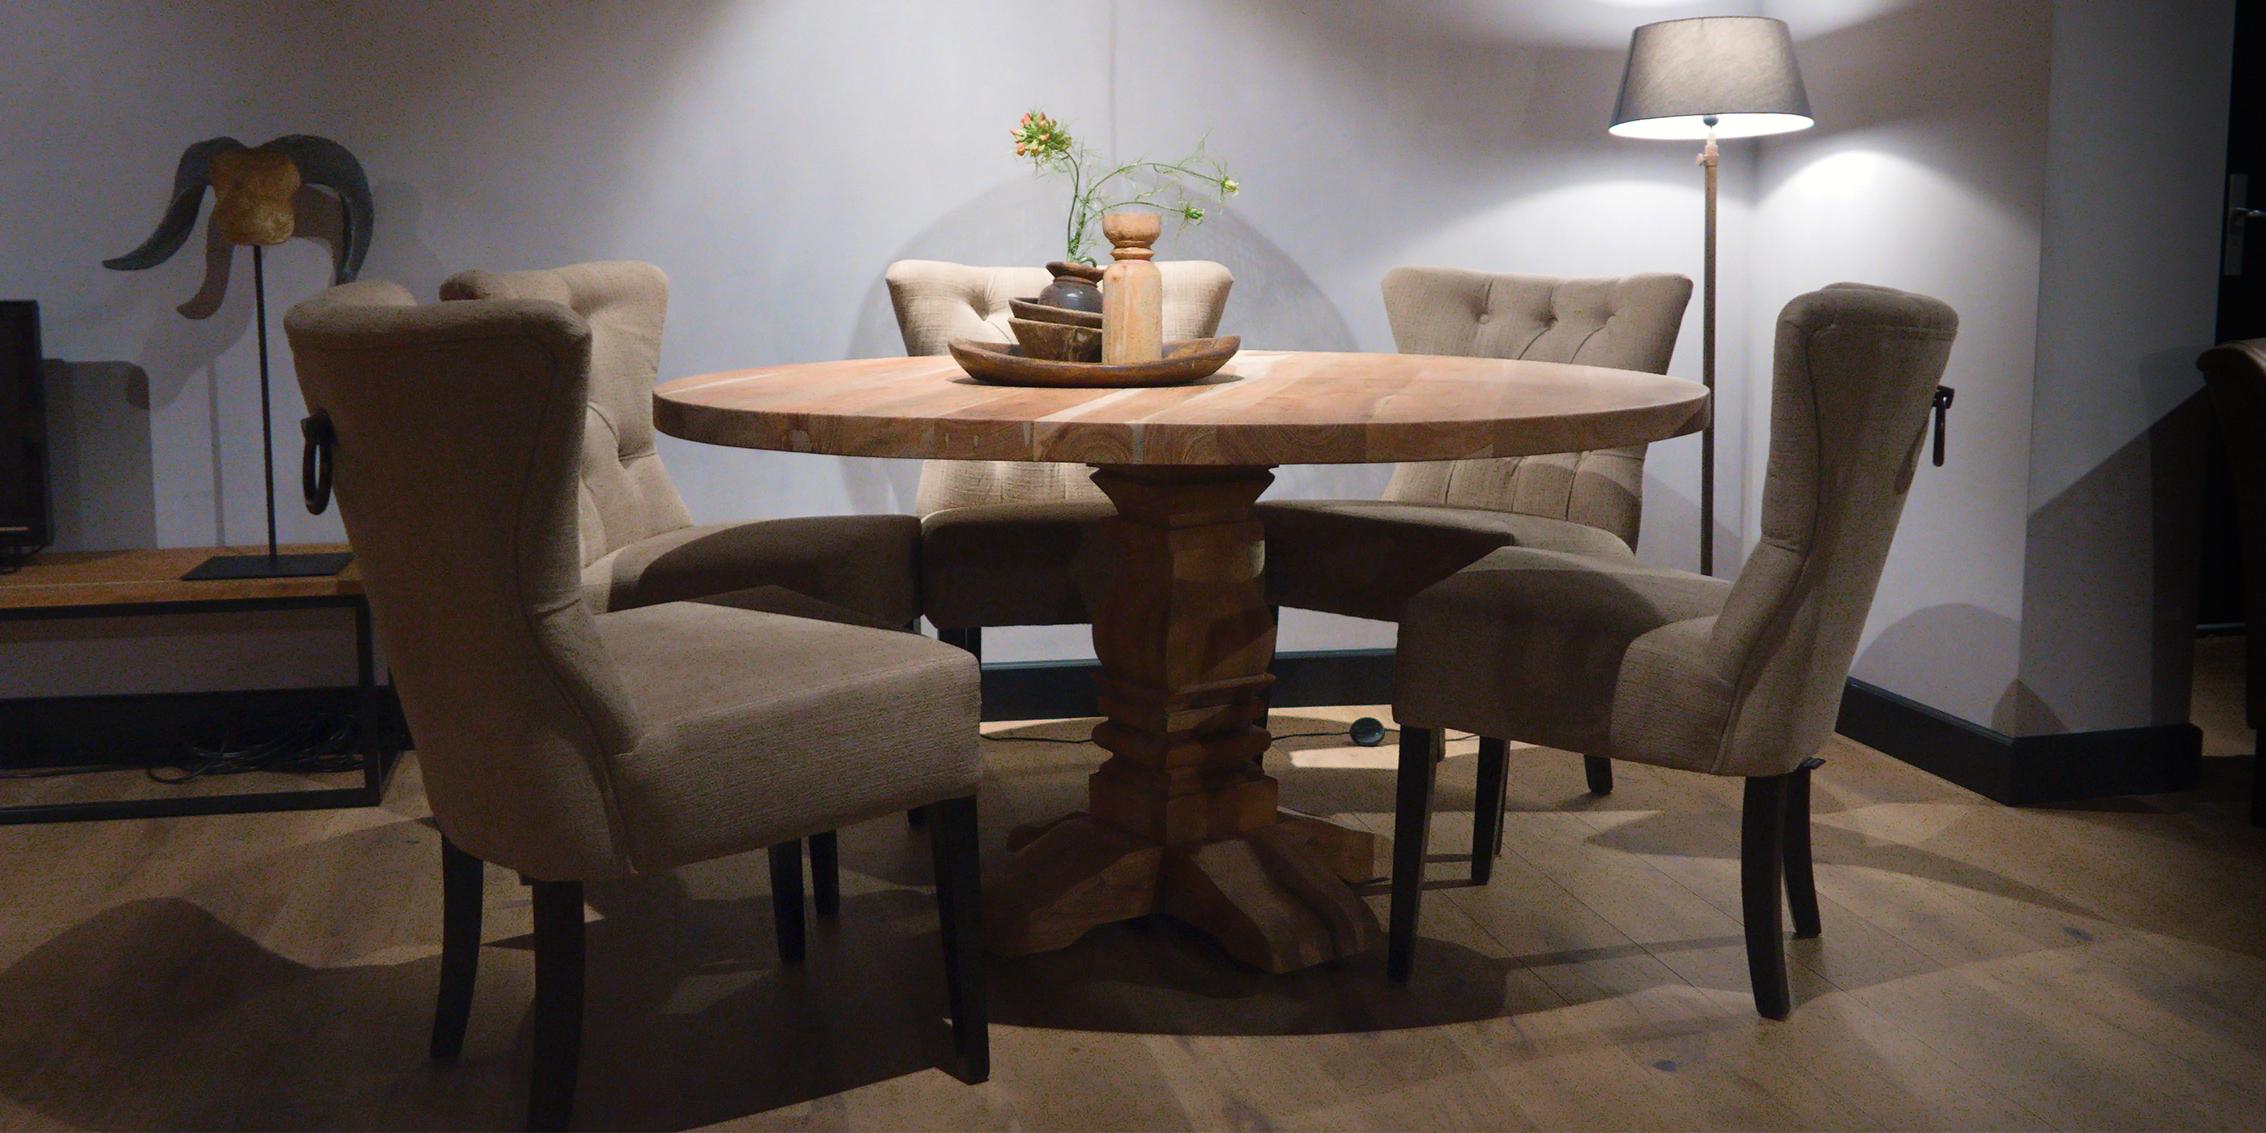 Pleasing Urban Sofa Robin Ronde Eettafel Dailytribune Chair Design For Home Dailytribuneorg